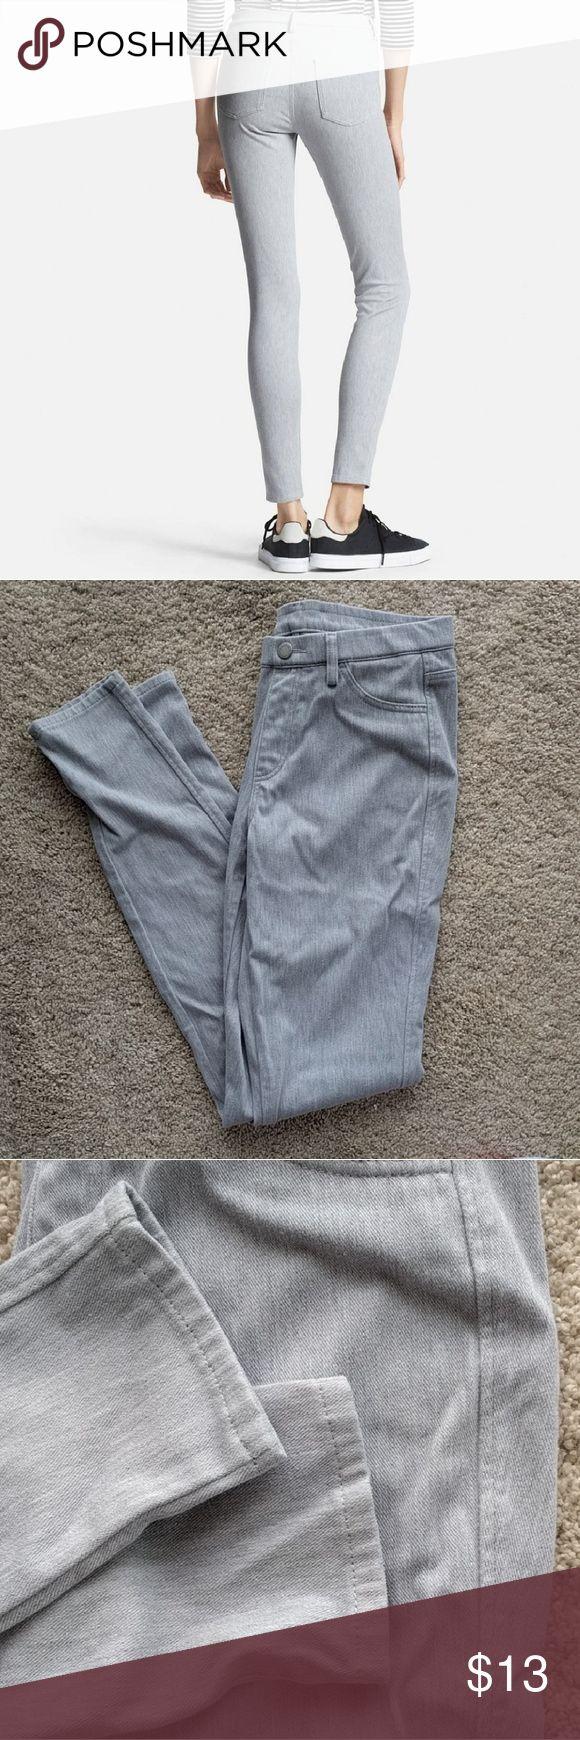 🌠 Uniqlo leggings Uniqlo grey/gray leggings.  Worn twice, one wash. Waist 26-27 inches Size S Uniqlo Pants Leggings